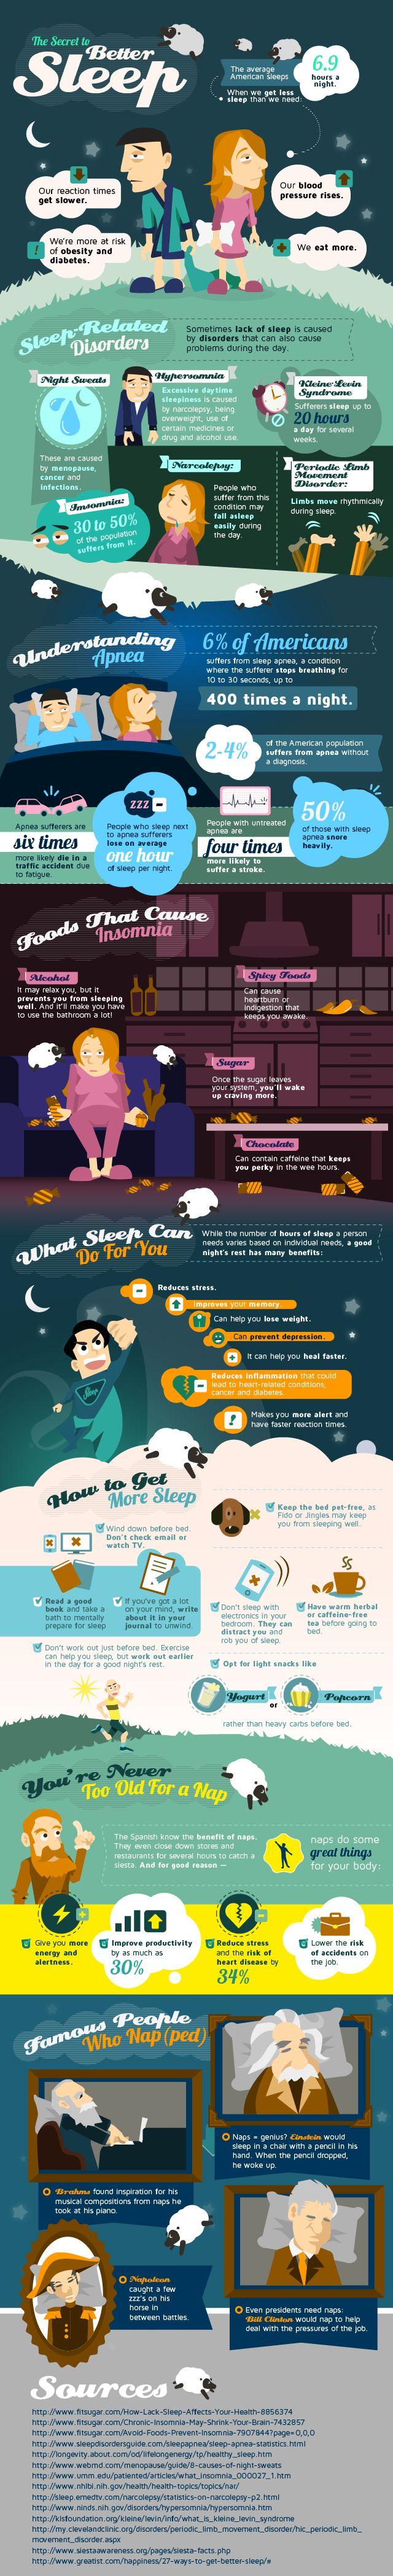 The Secret to Better Sleep #IN